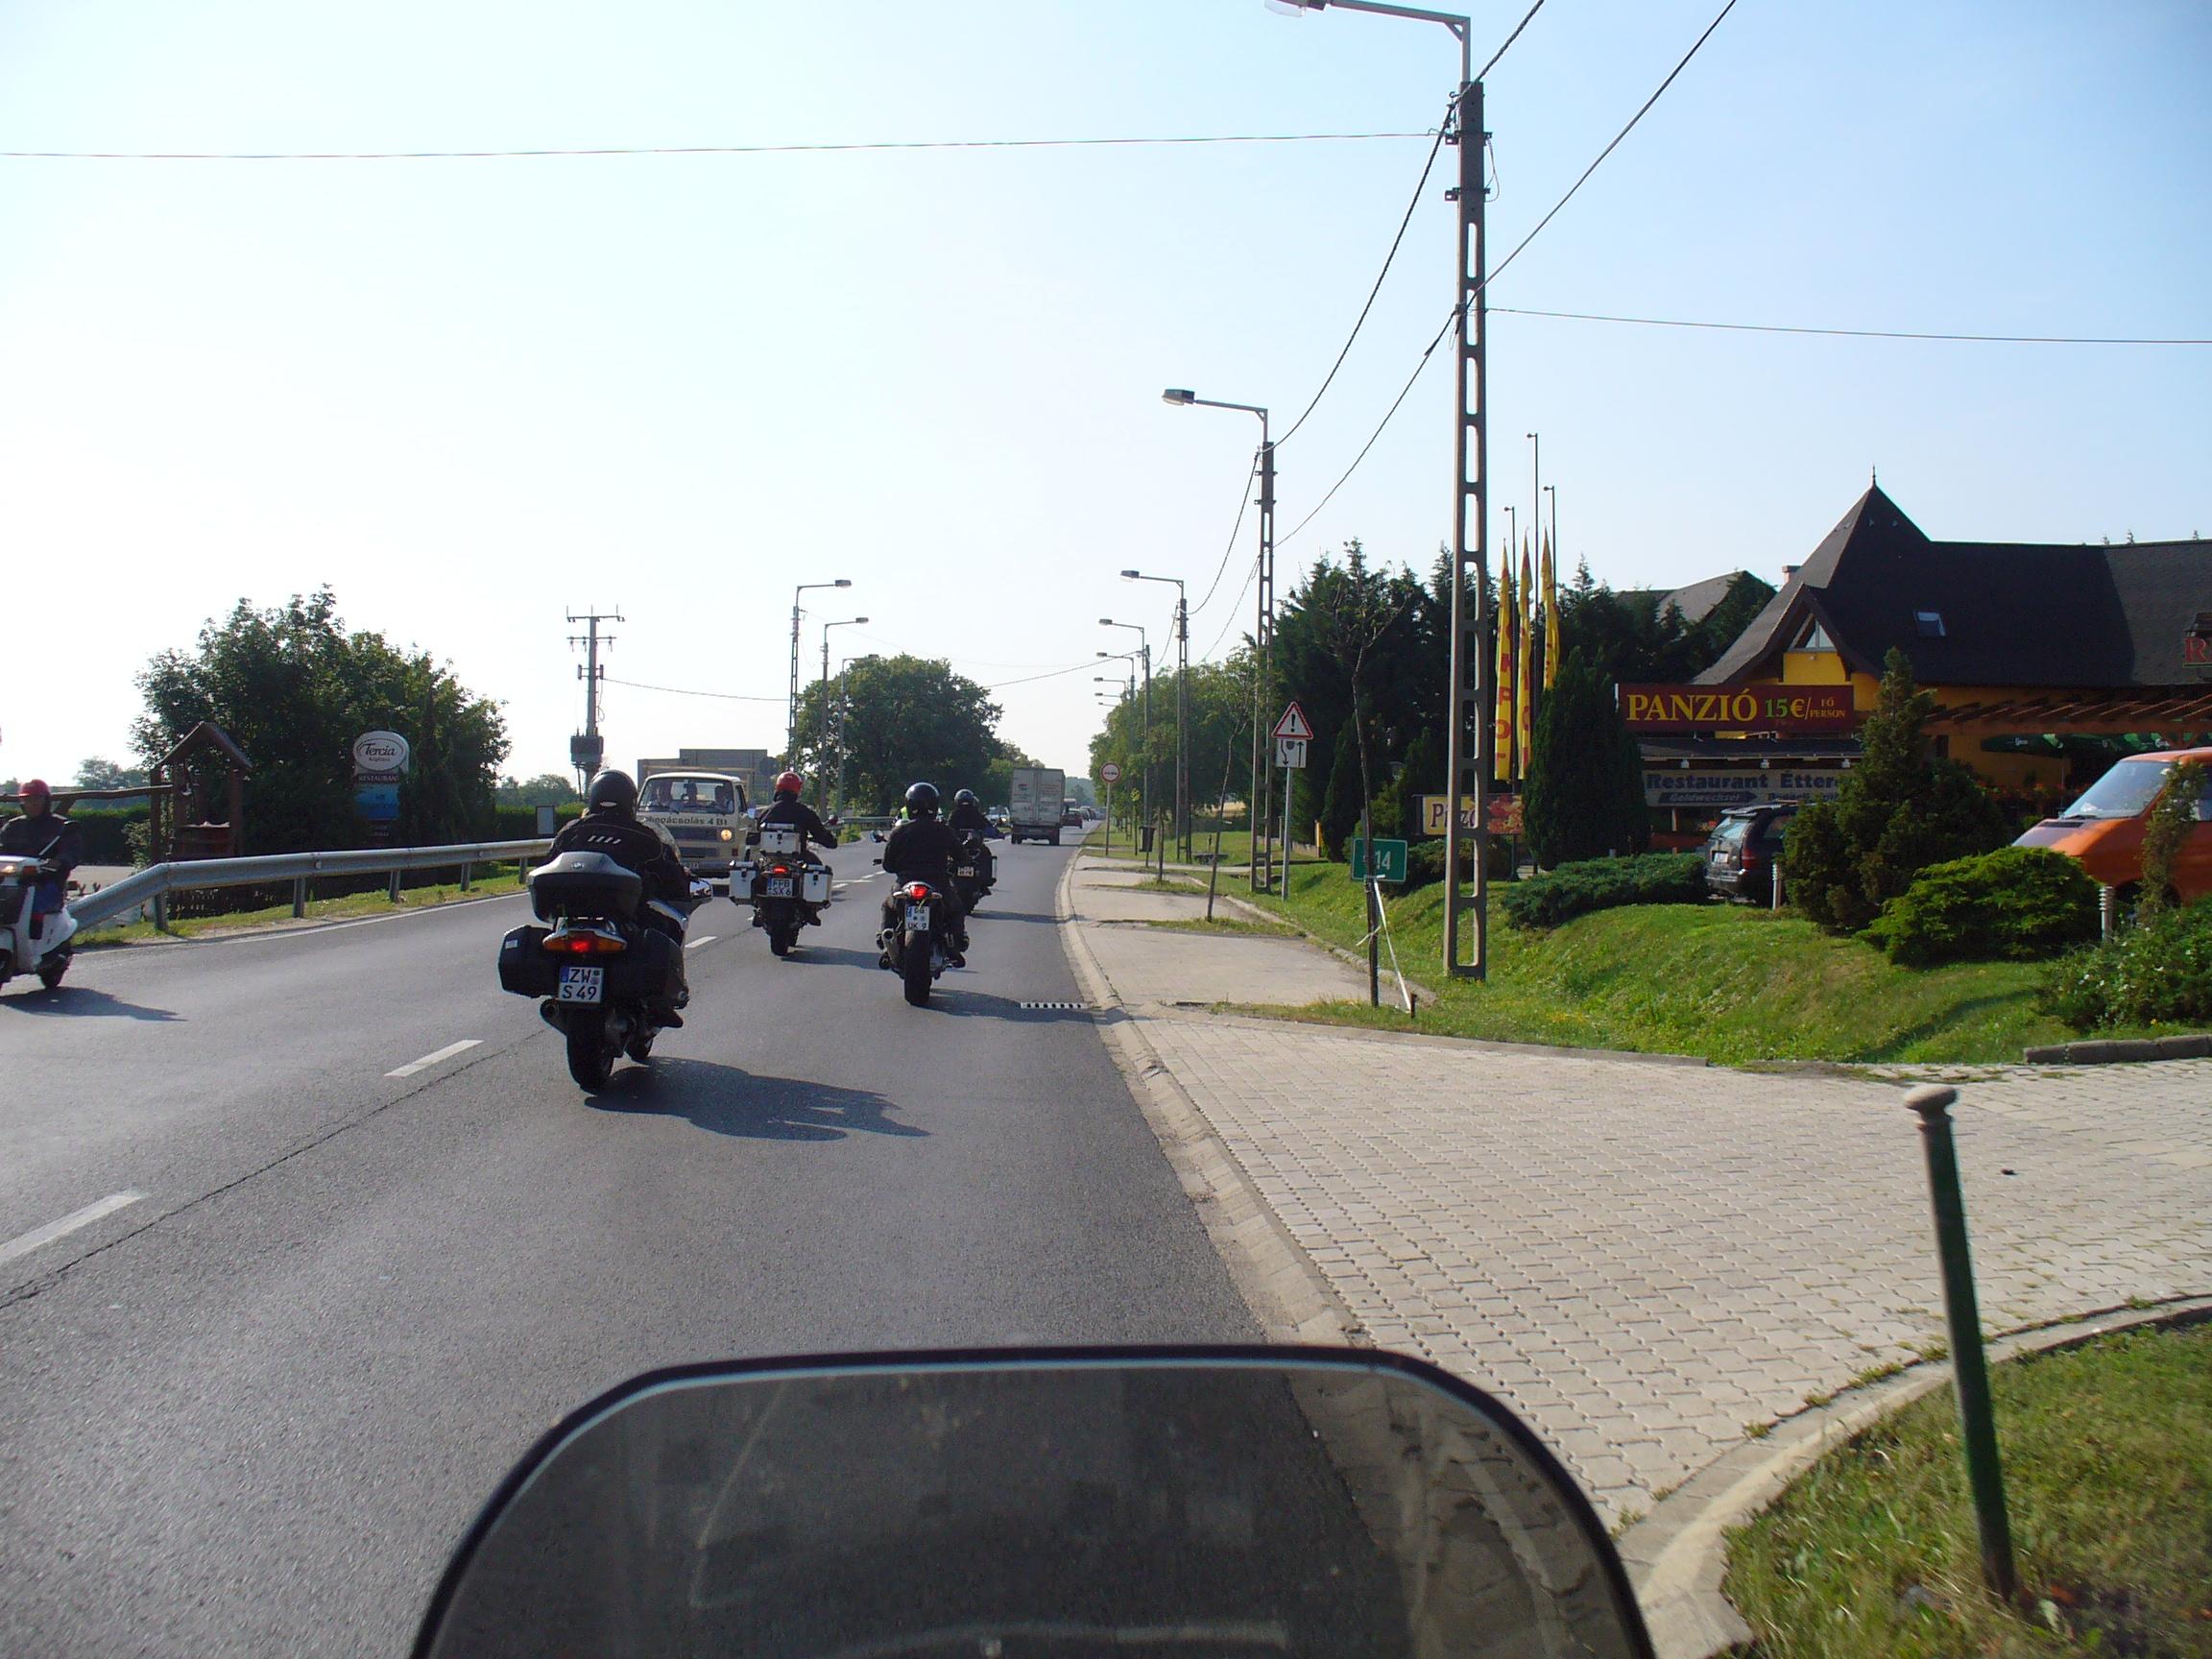 p1030506.jpg